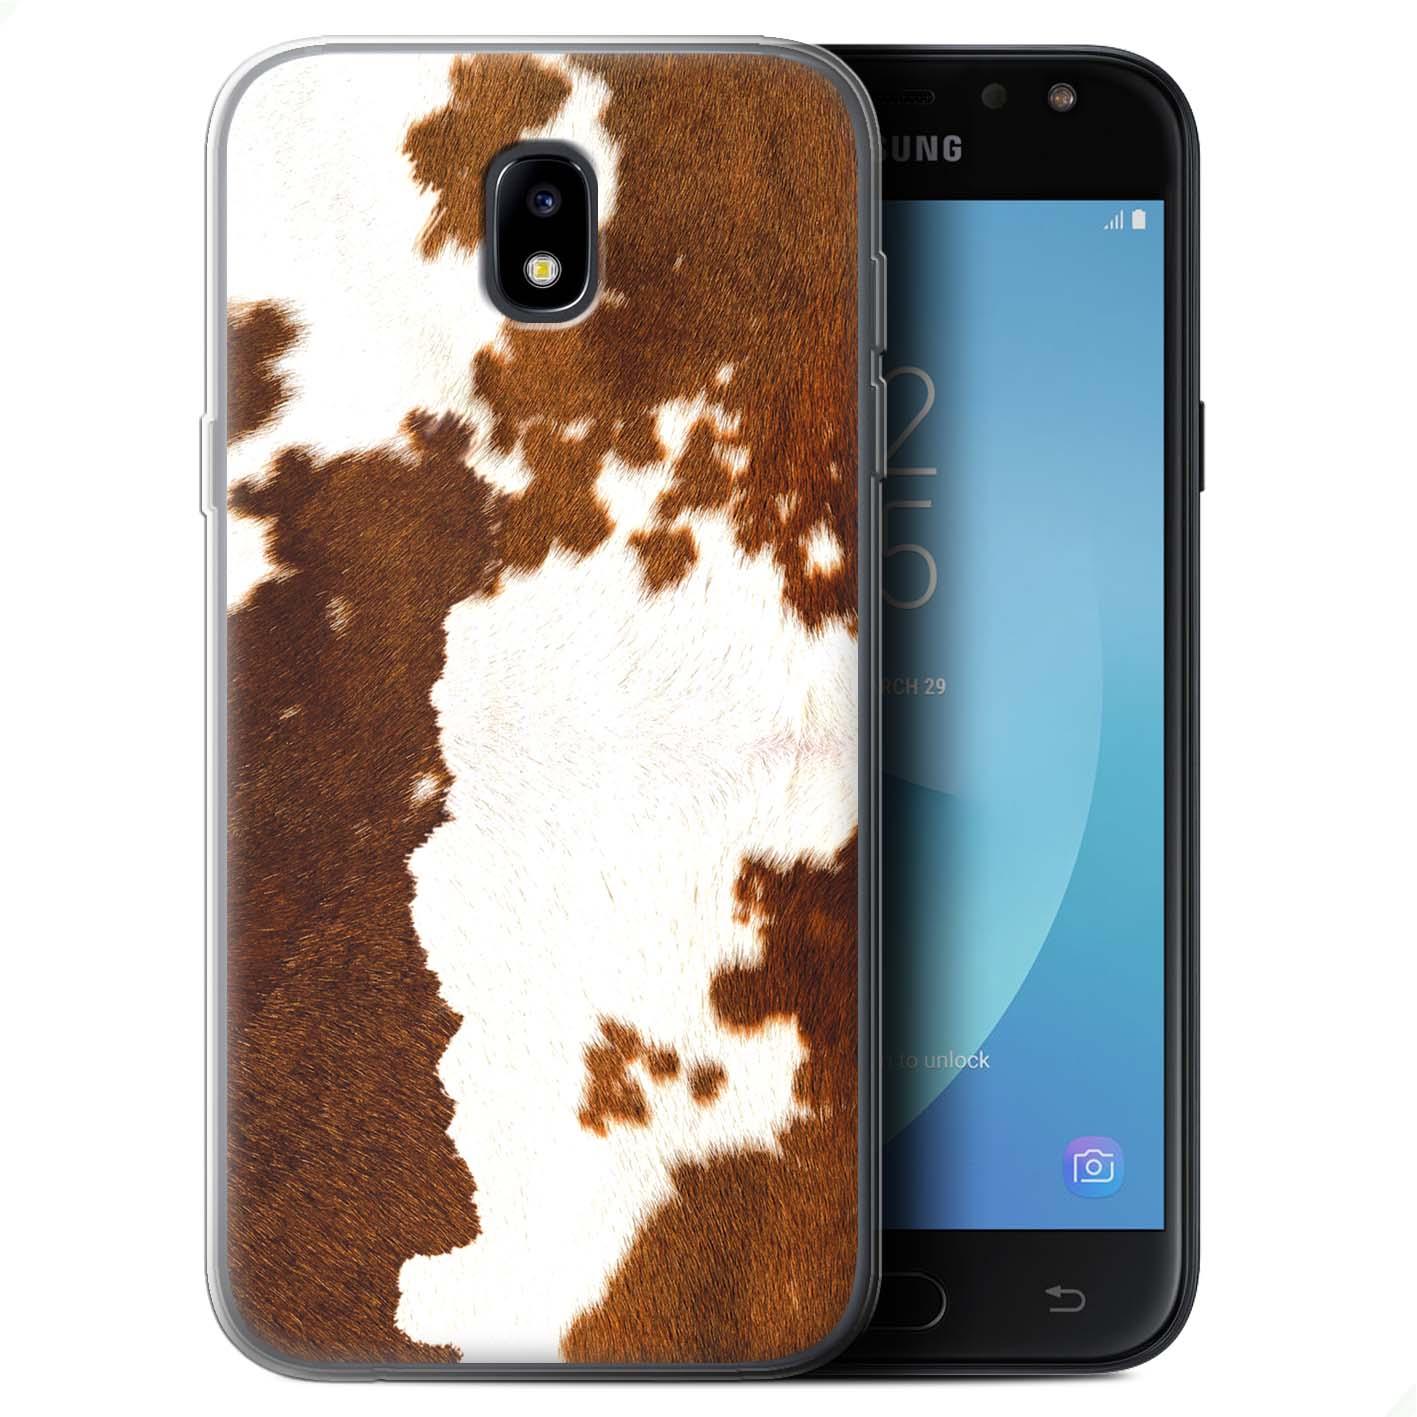 Gel-TPU-Case-Cover-for-Samsung-Galaxy-J7-2017-J730-Animal-Fur-Effect-Pattern